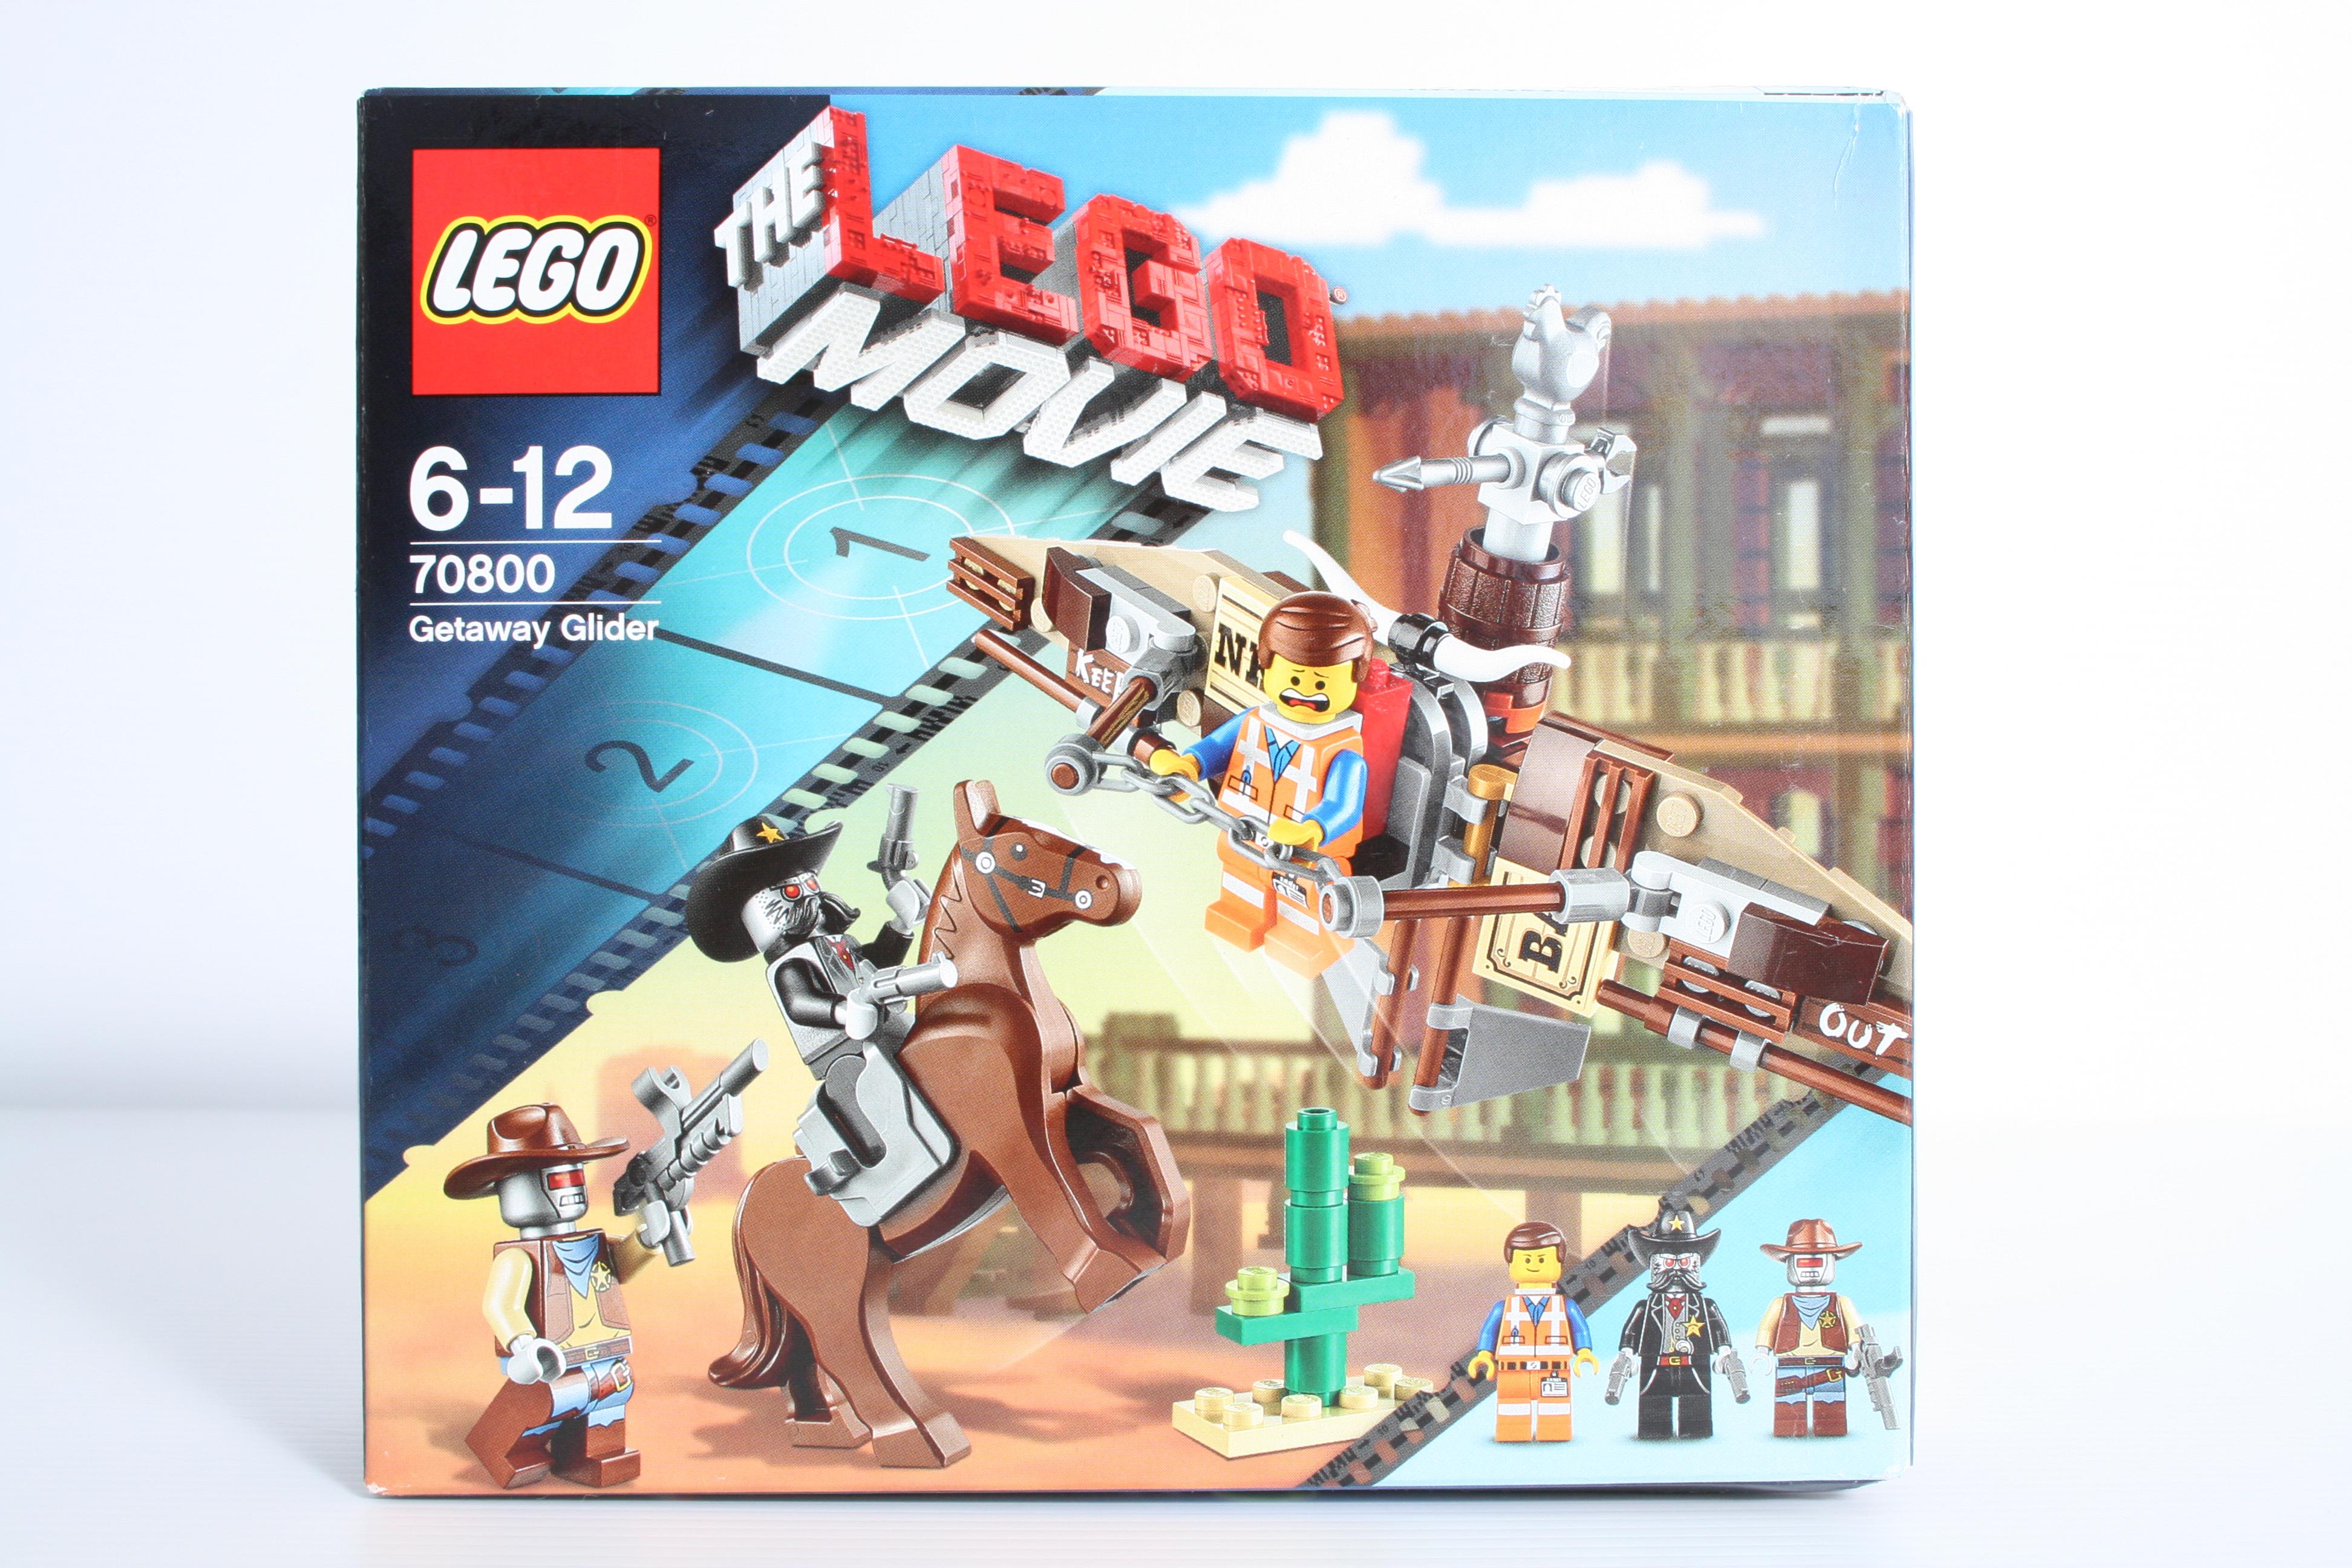 lego movie set reviews index rebrickable build with lego